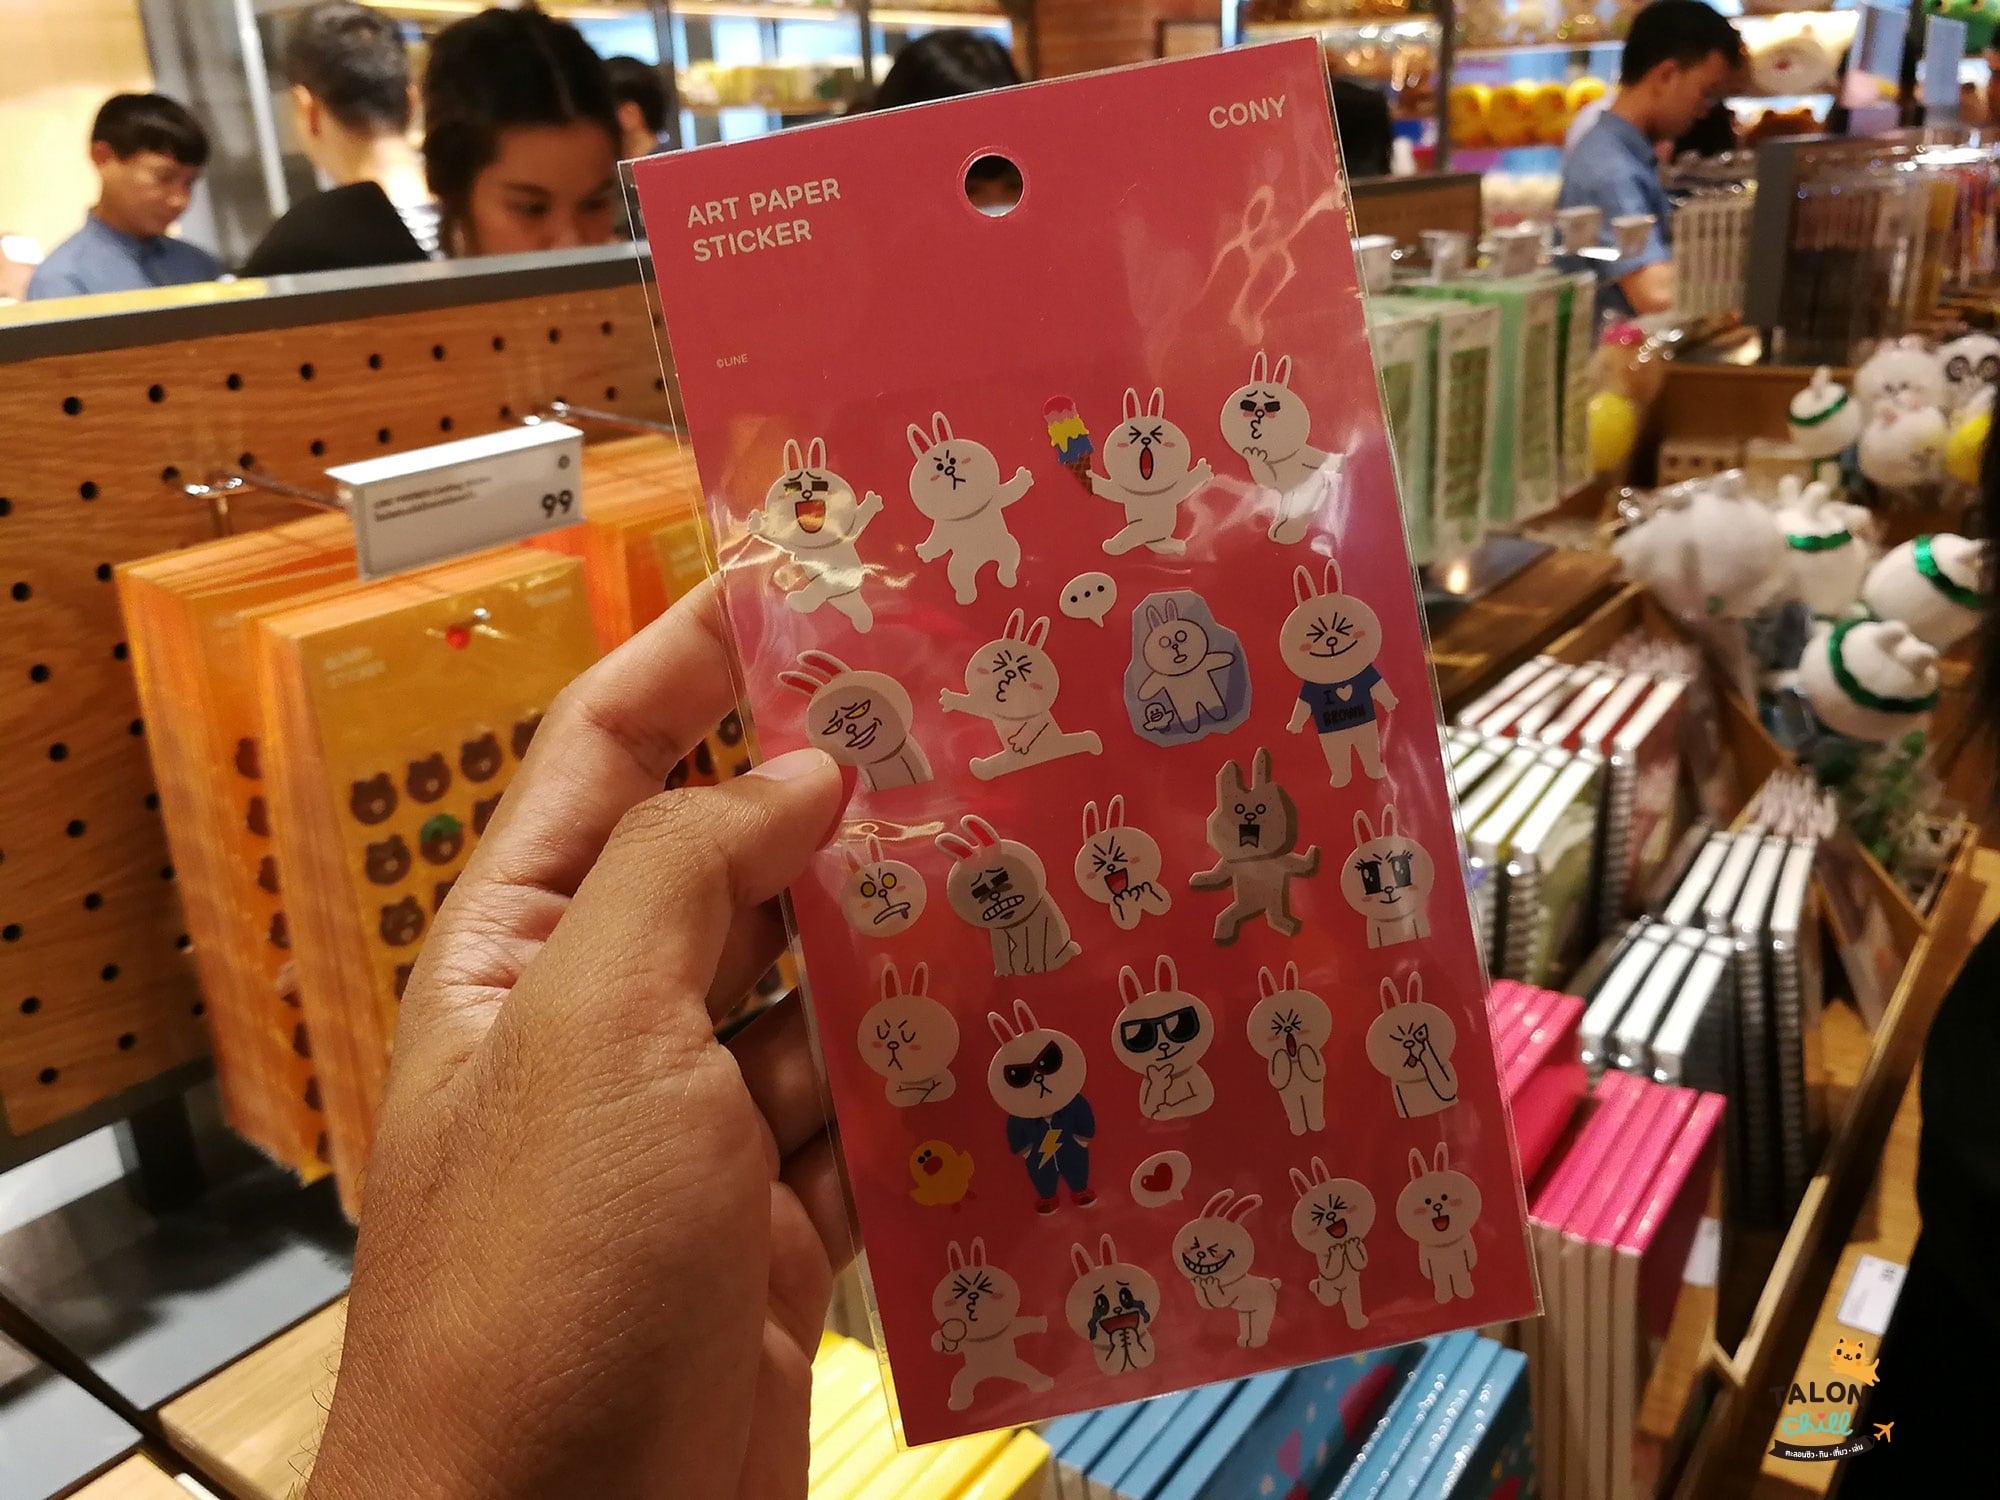 [Review] ร้าน LINE VILLAGE BANGKOK สินค้าลิขสิทธิ์ของ LINE FRIENDS CHARACTER